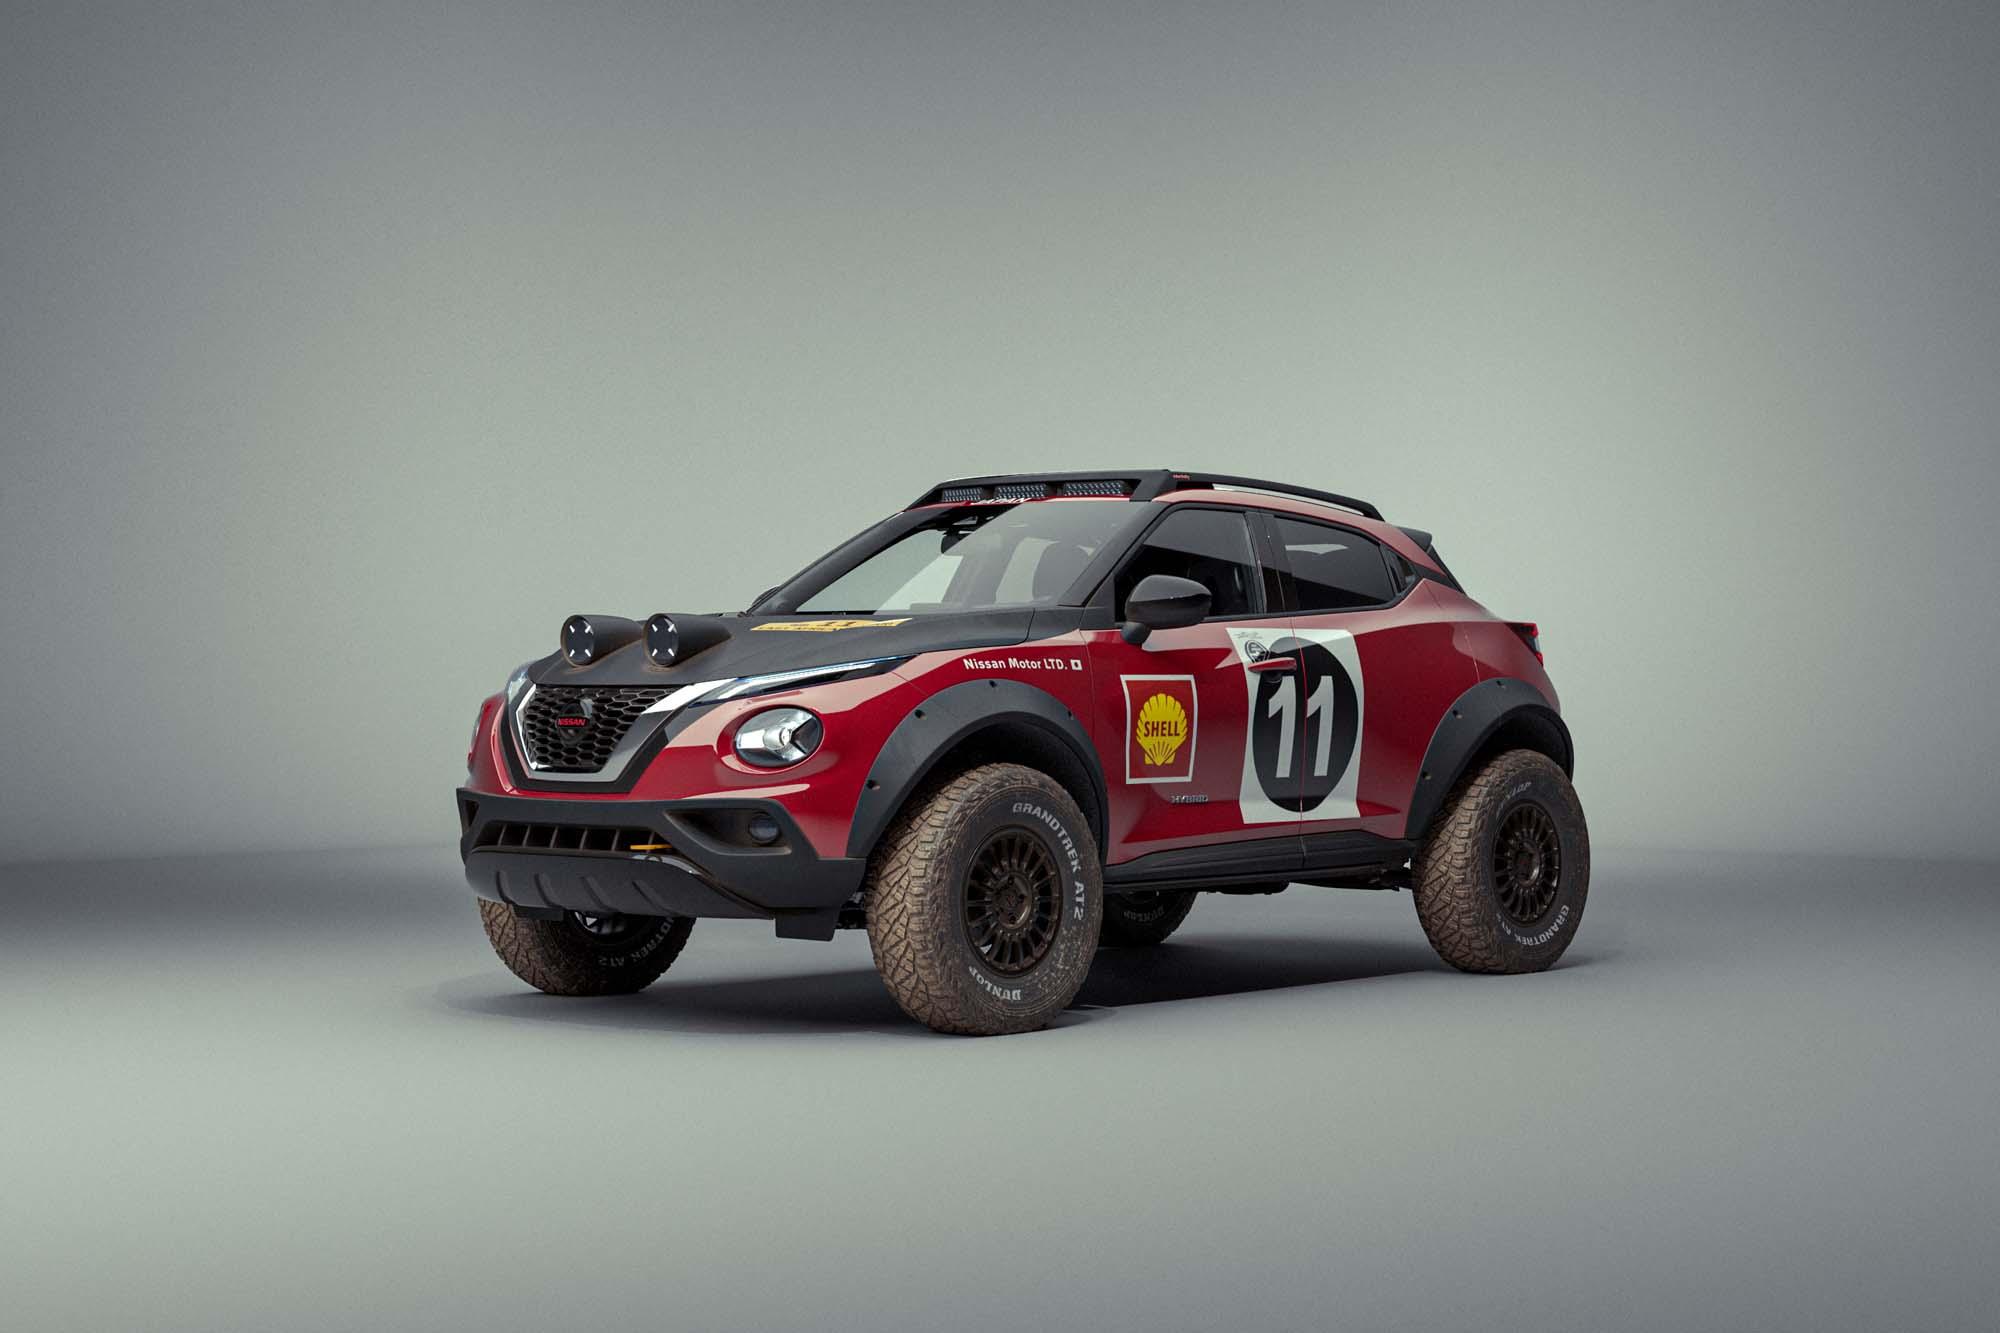 JUKE Rally Heritage Concept 1.JPG Πώς σου φαίνεται αυτό το Nissan Juke Rally; Nissan, Nissan Juke, zblog, ειδήσεις, Νέα